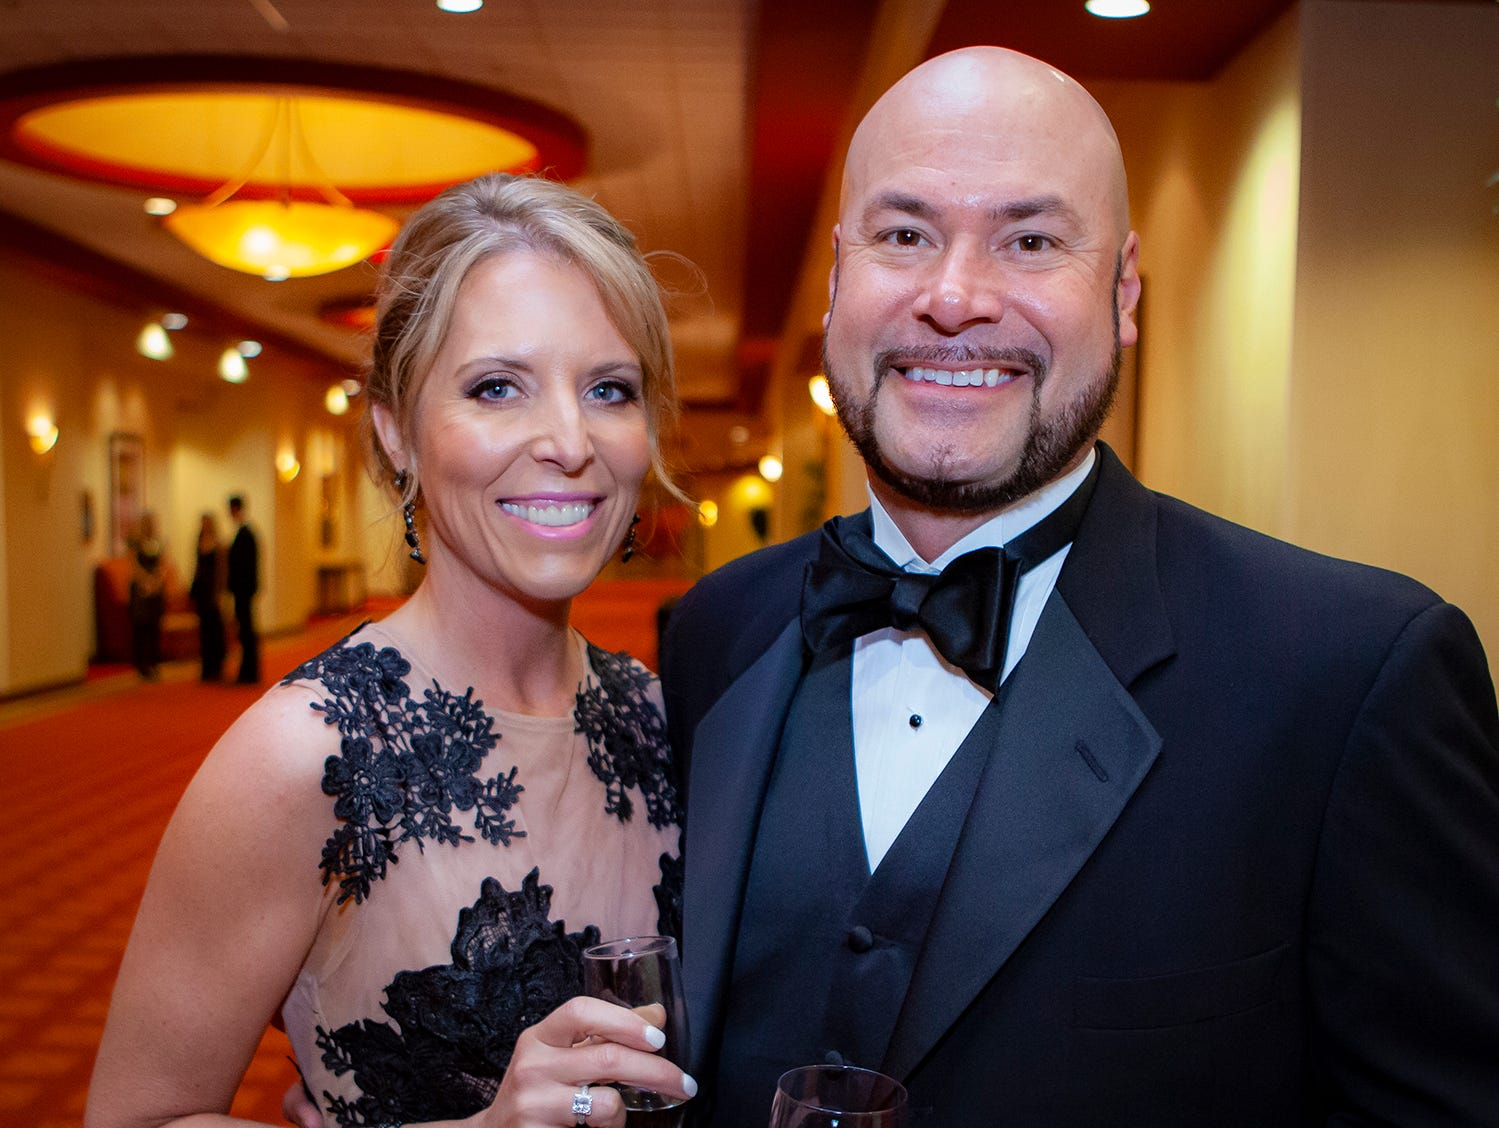 Amy and Chad Hill at the 2019 Saint Thomas Rutherford Foundation Gala on Saturday, Jan. 19, 2019 at Embassy Suites Murfreesboro.